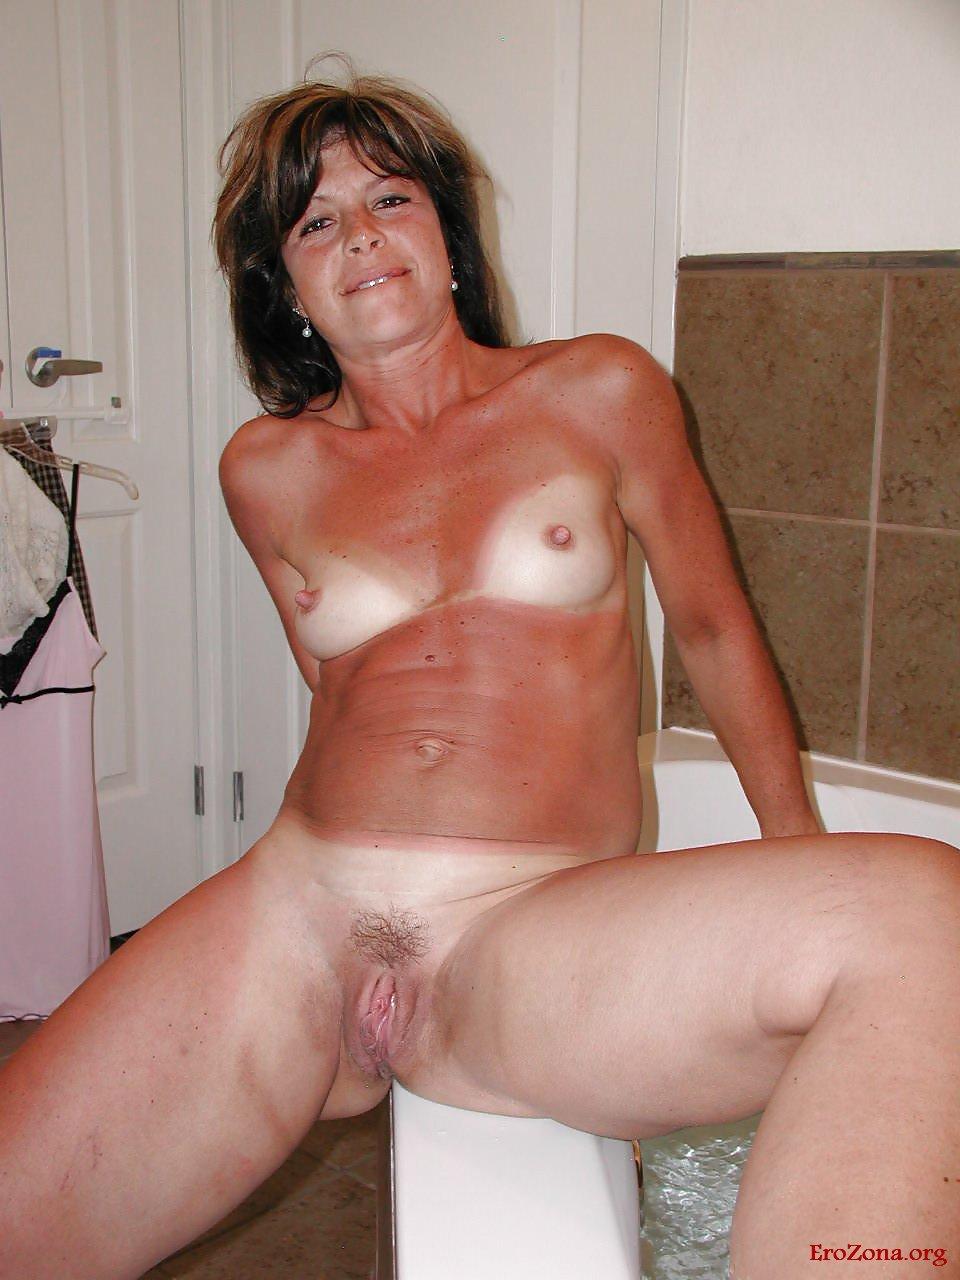 Naked Mature Amature Women